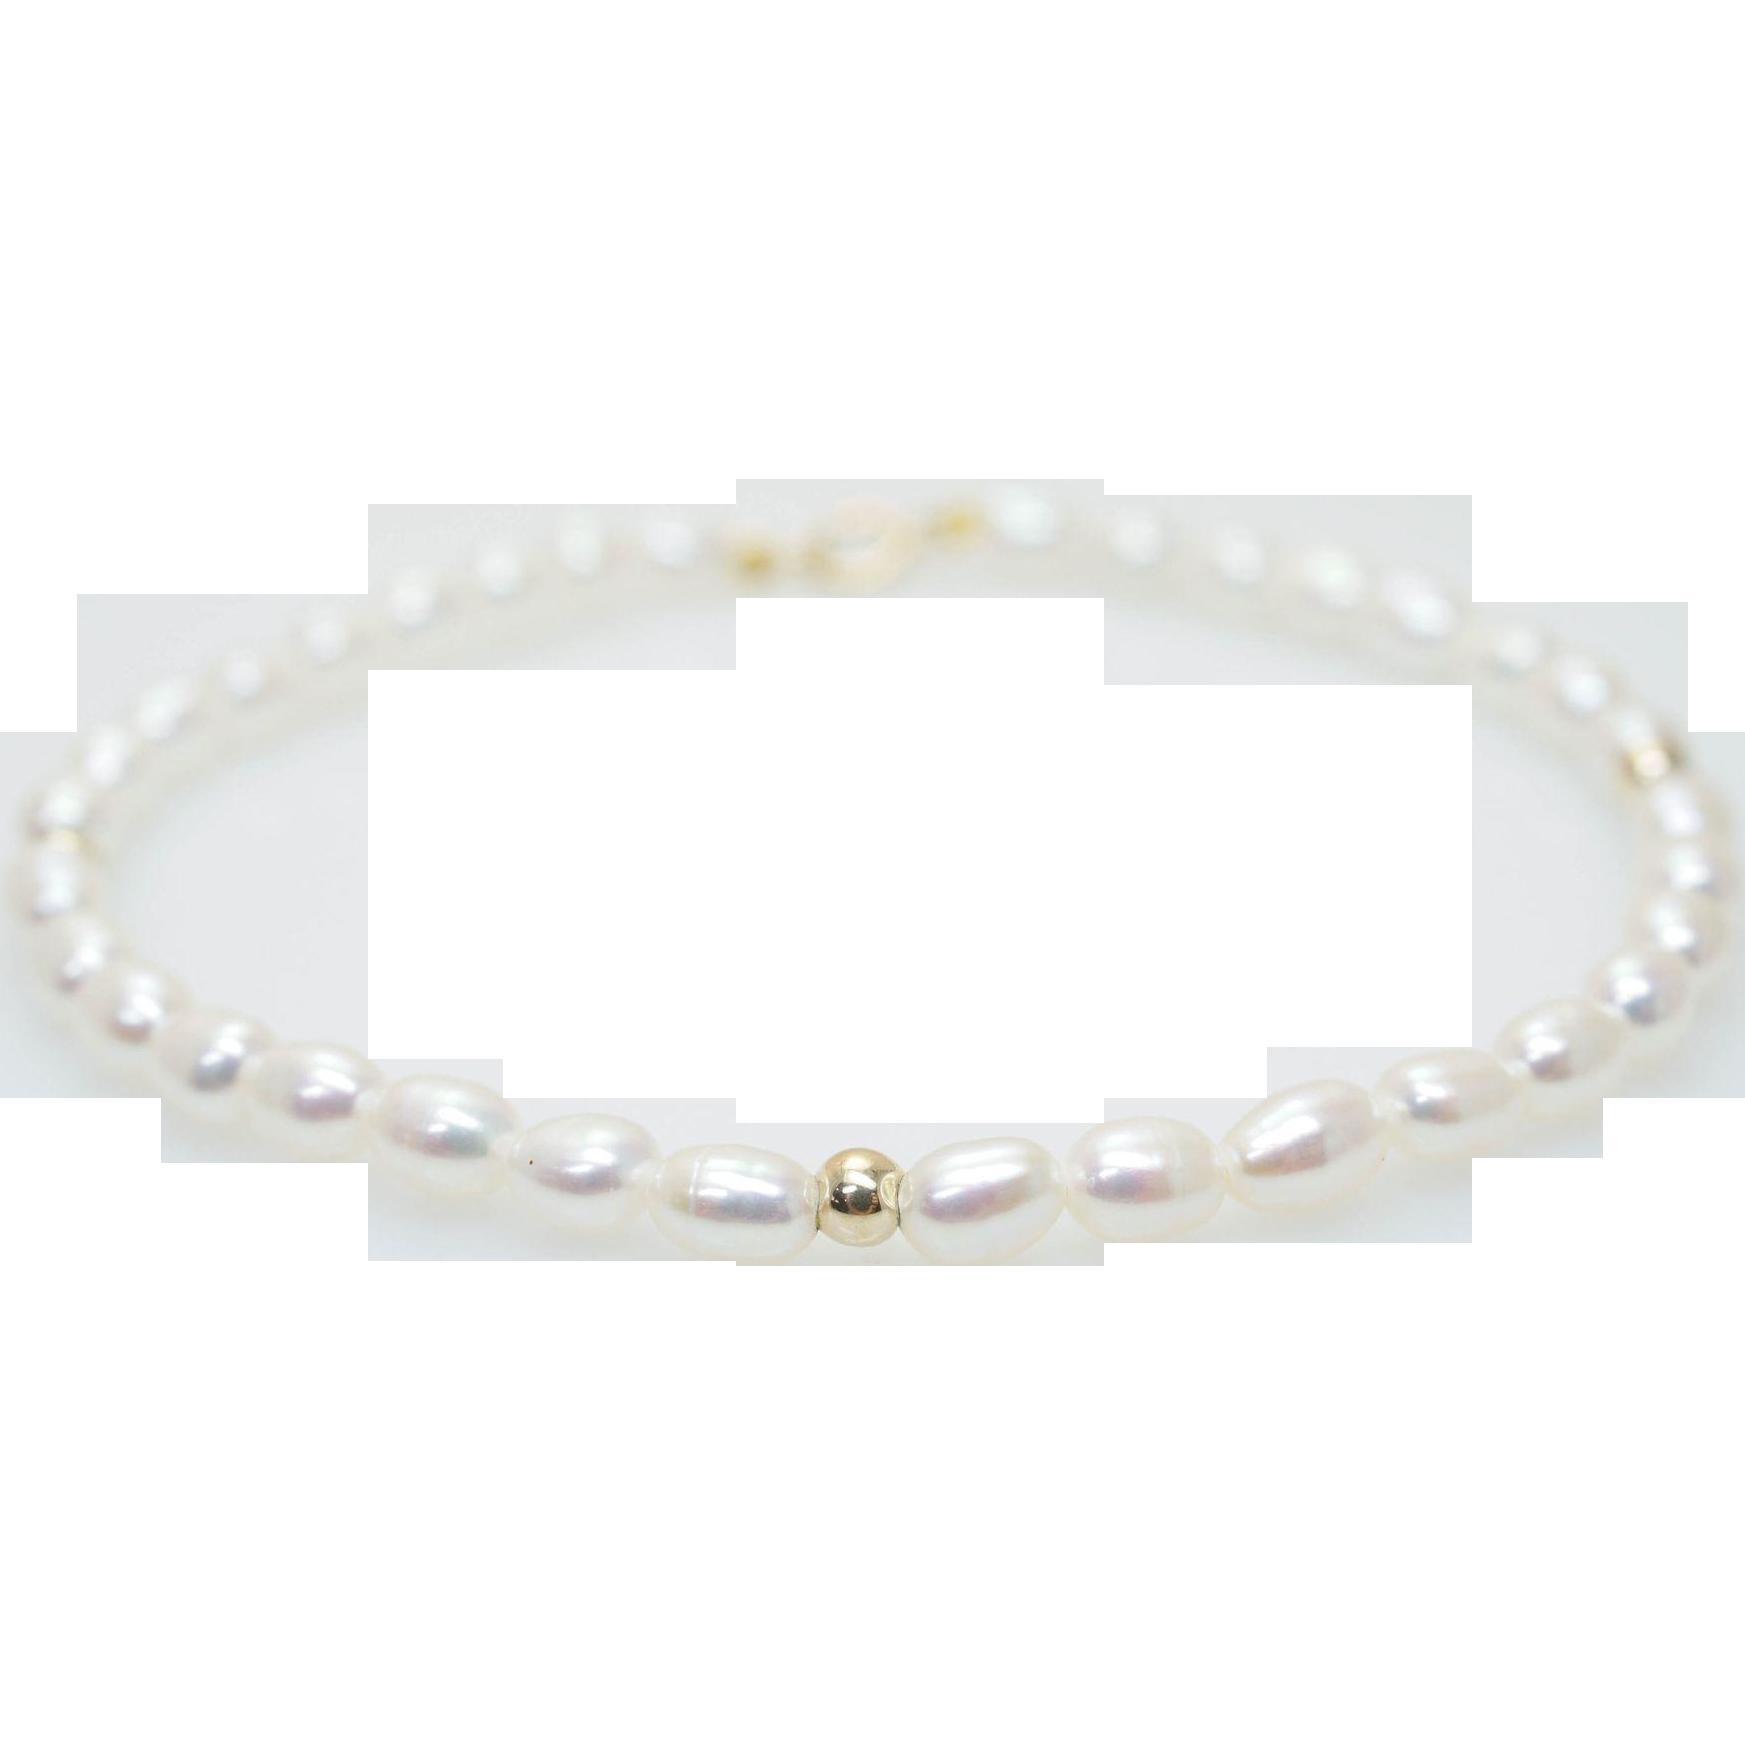 Dainty Cultured Freshwater Pearl Bracelet Simple Delicate Bracelet Small Simple Ivory Bracelet